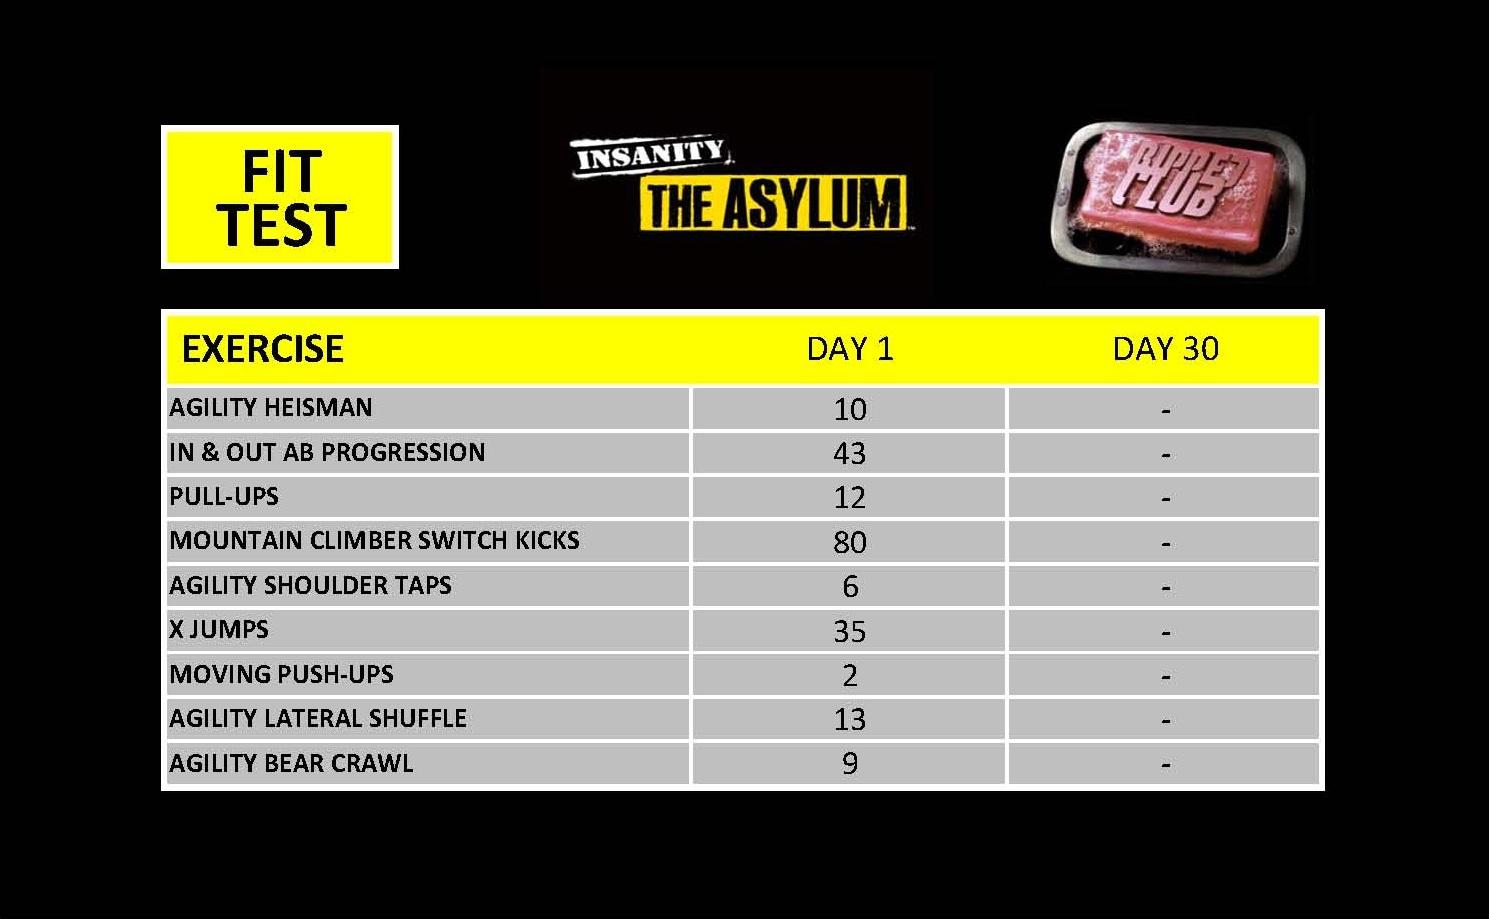 My Asylum Fit Test Day 1